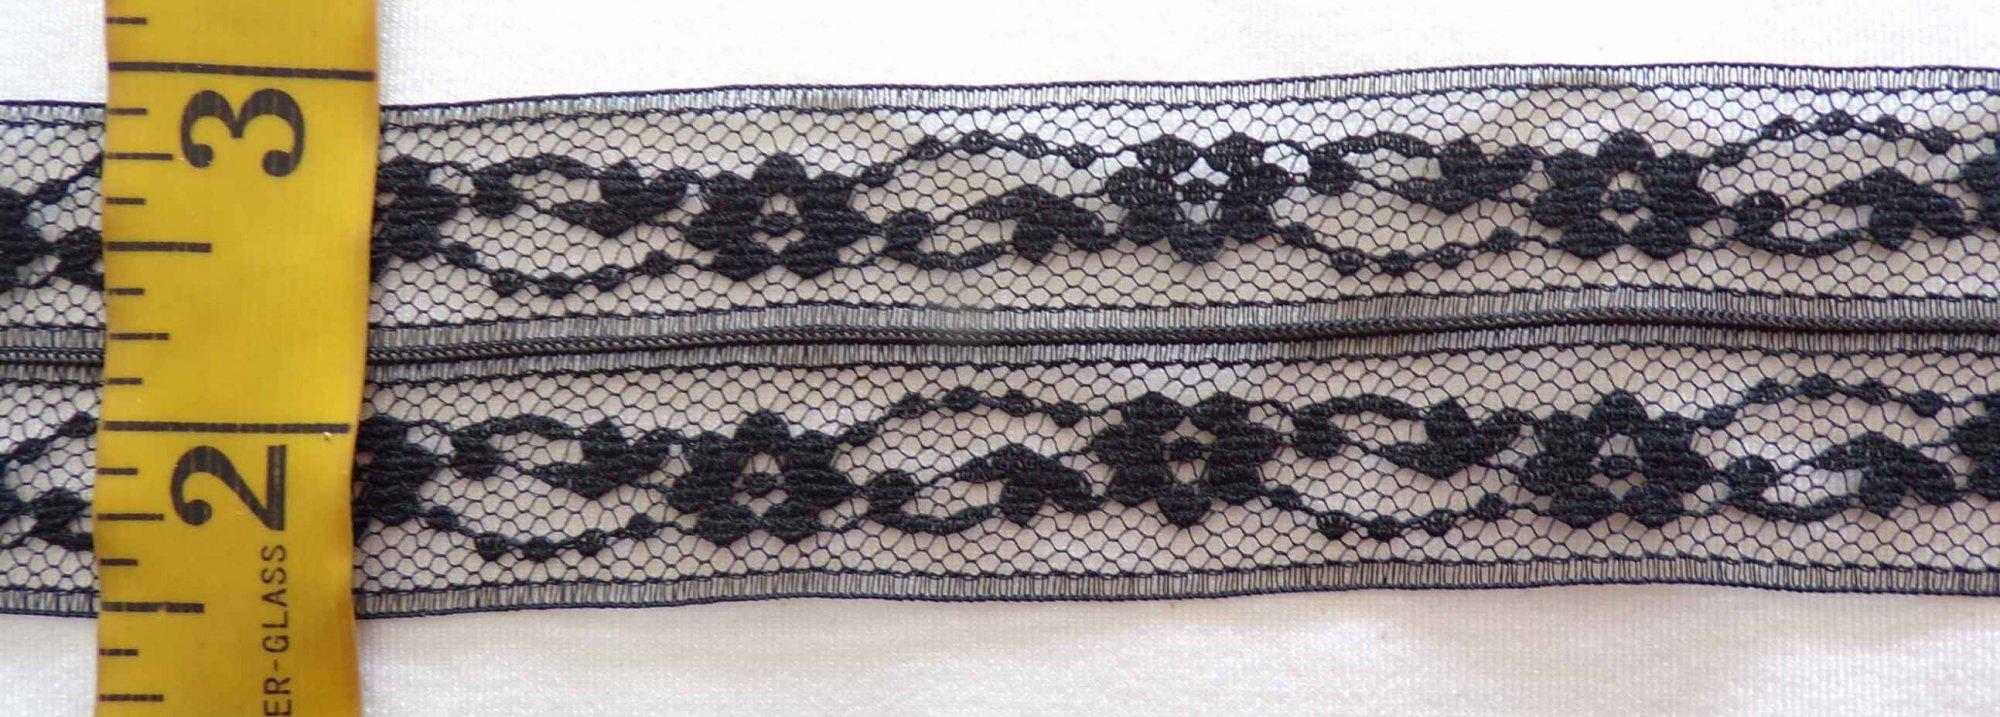 1 3/4 Black Rigid Lace